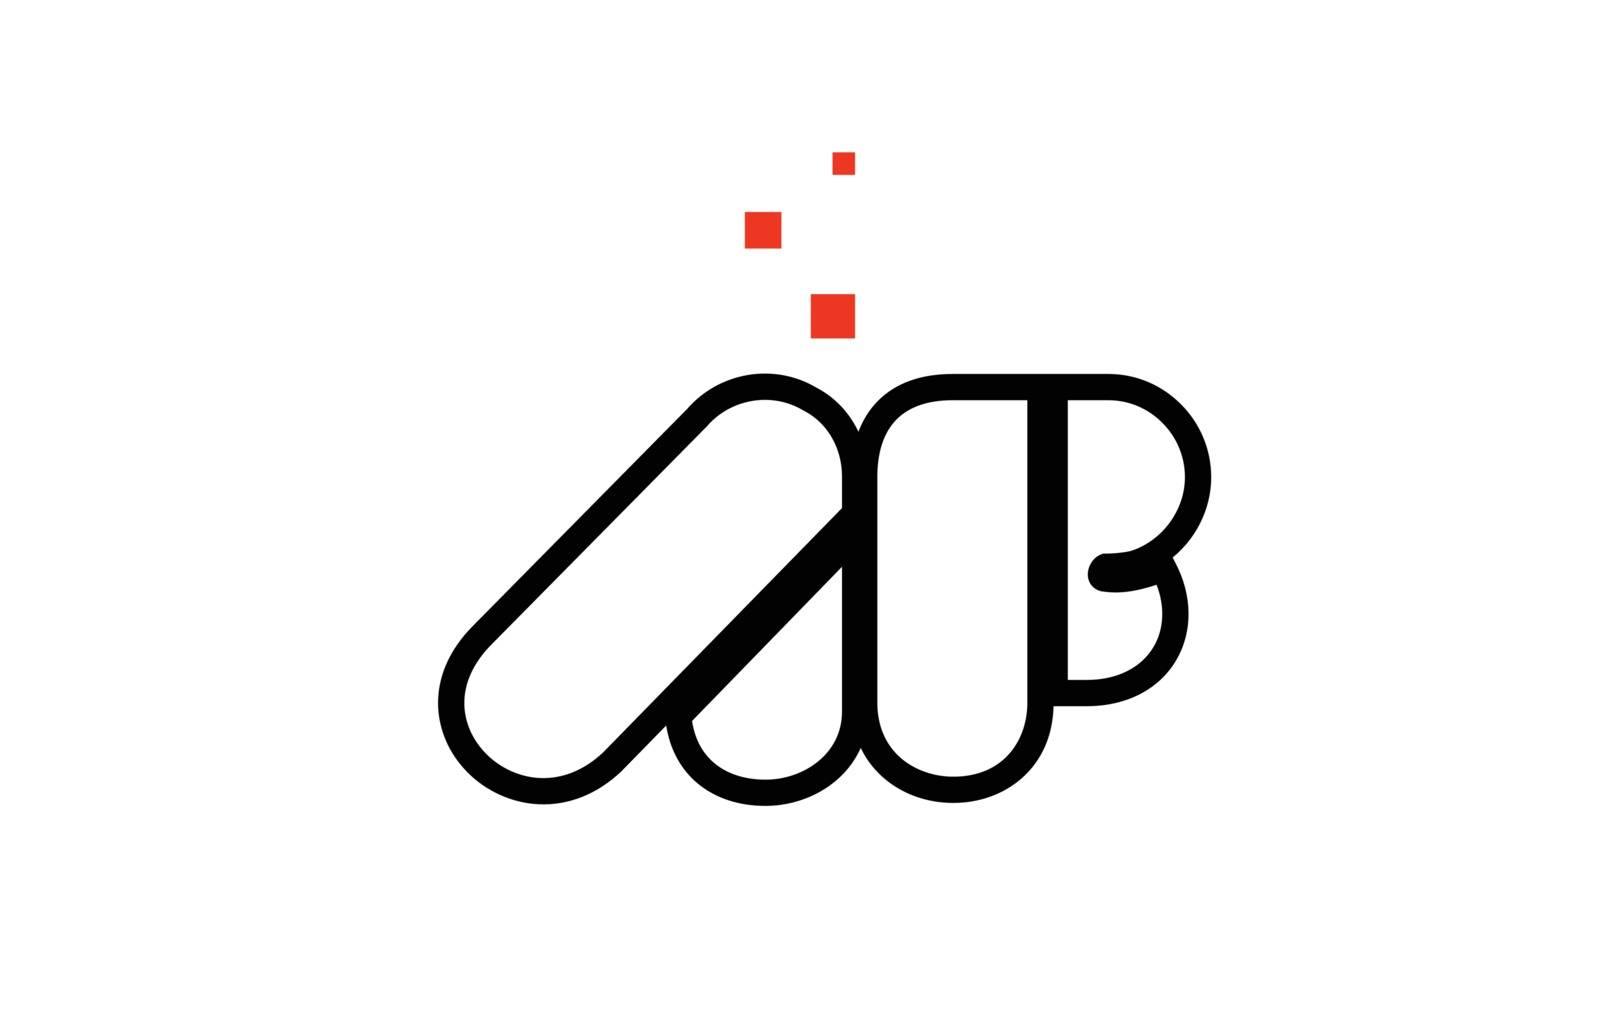 AF A F black white red alphabet letter combination logo icon des by dragomirescu